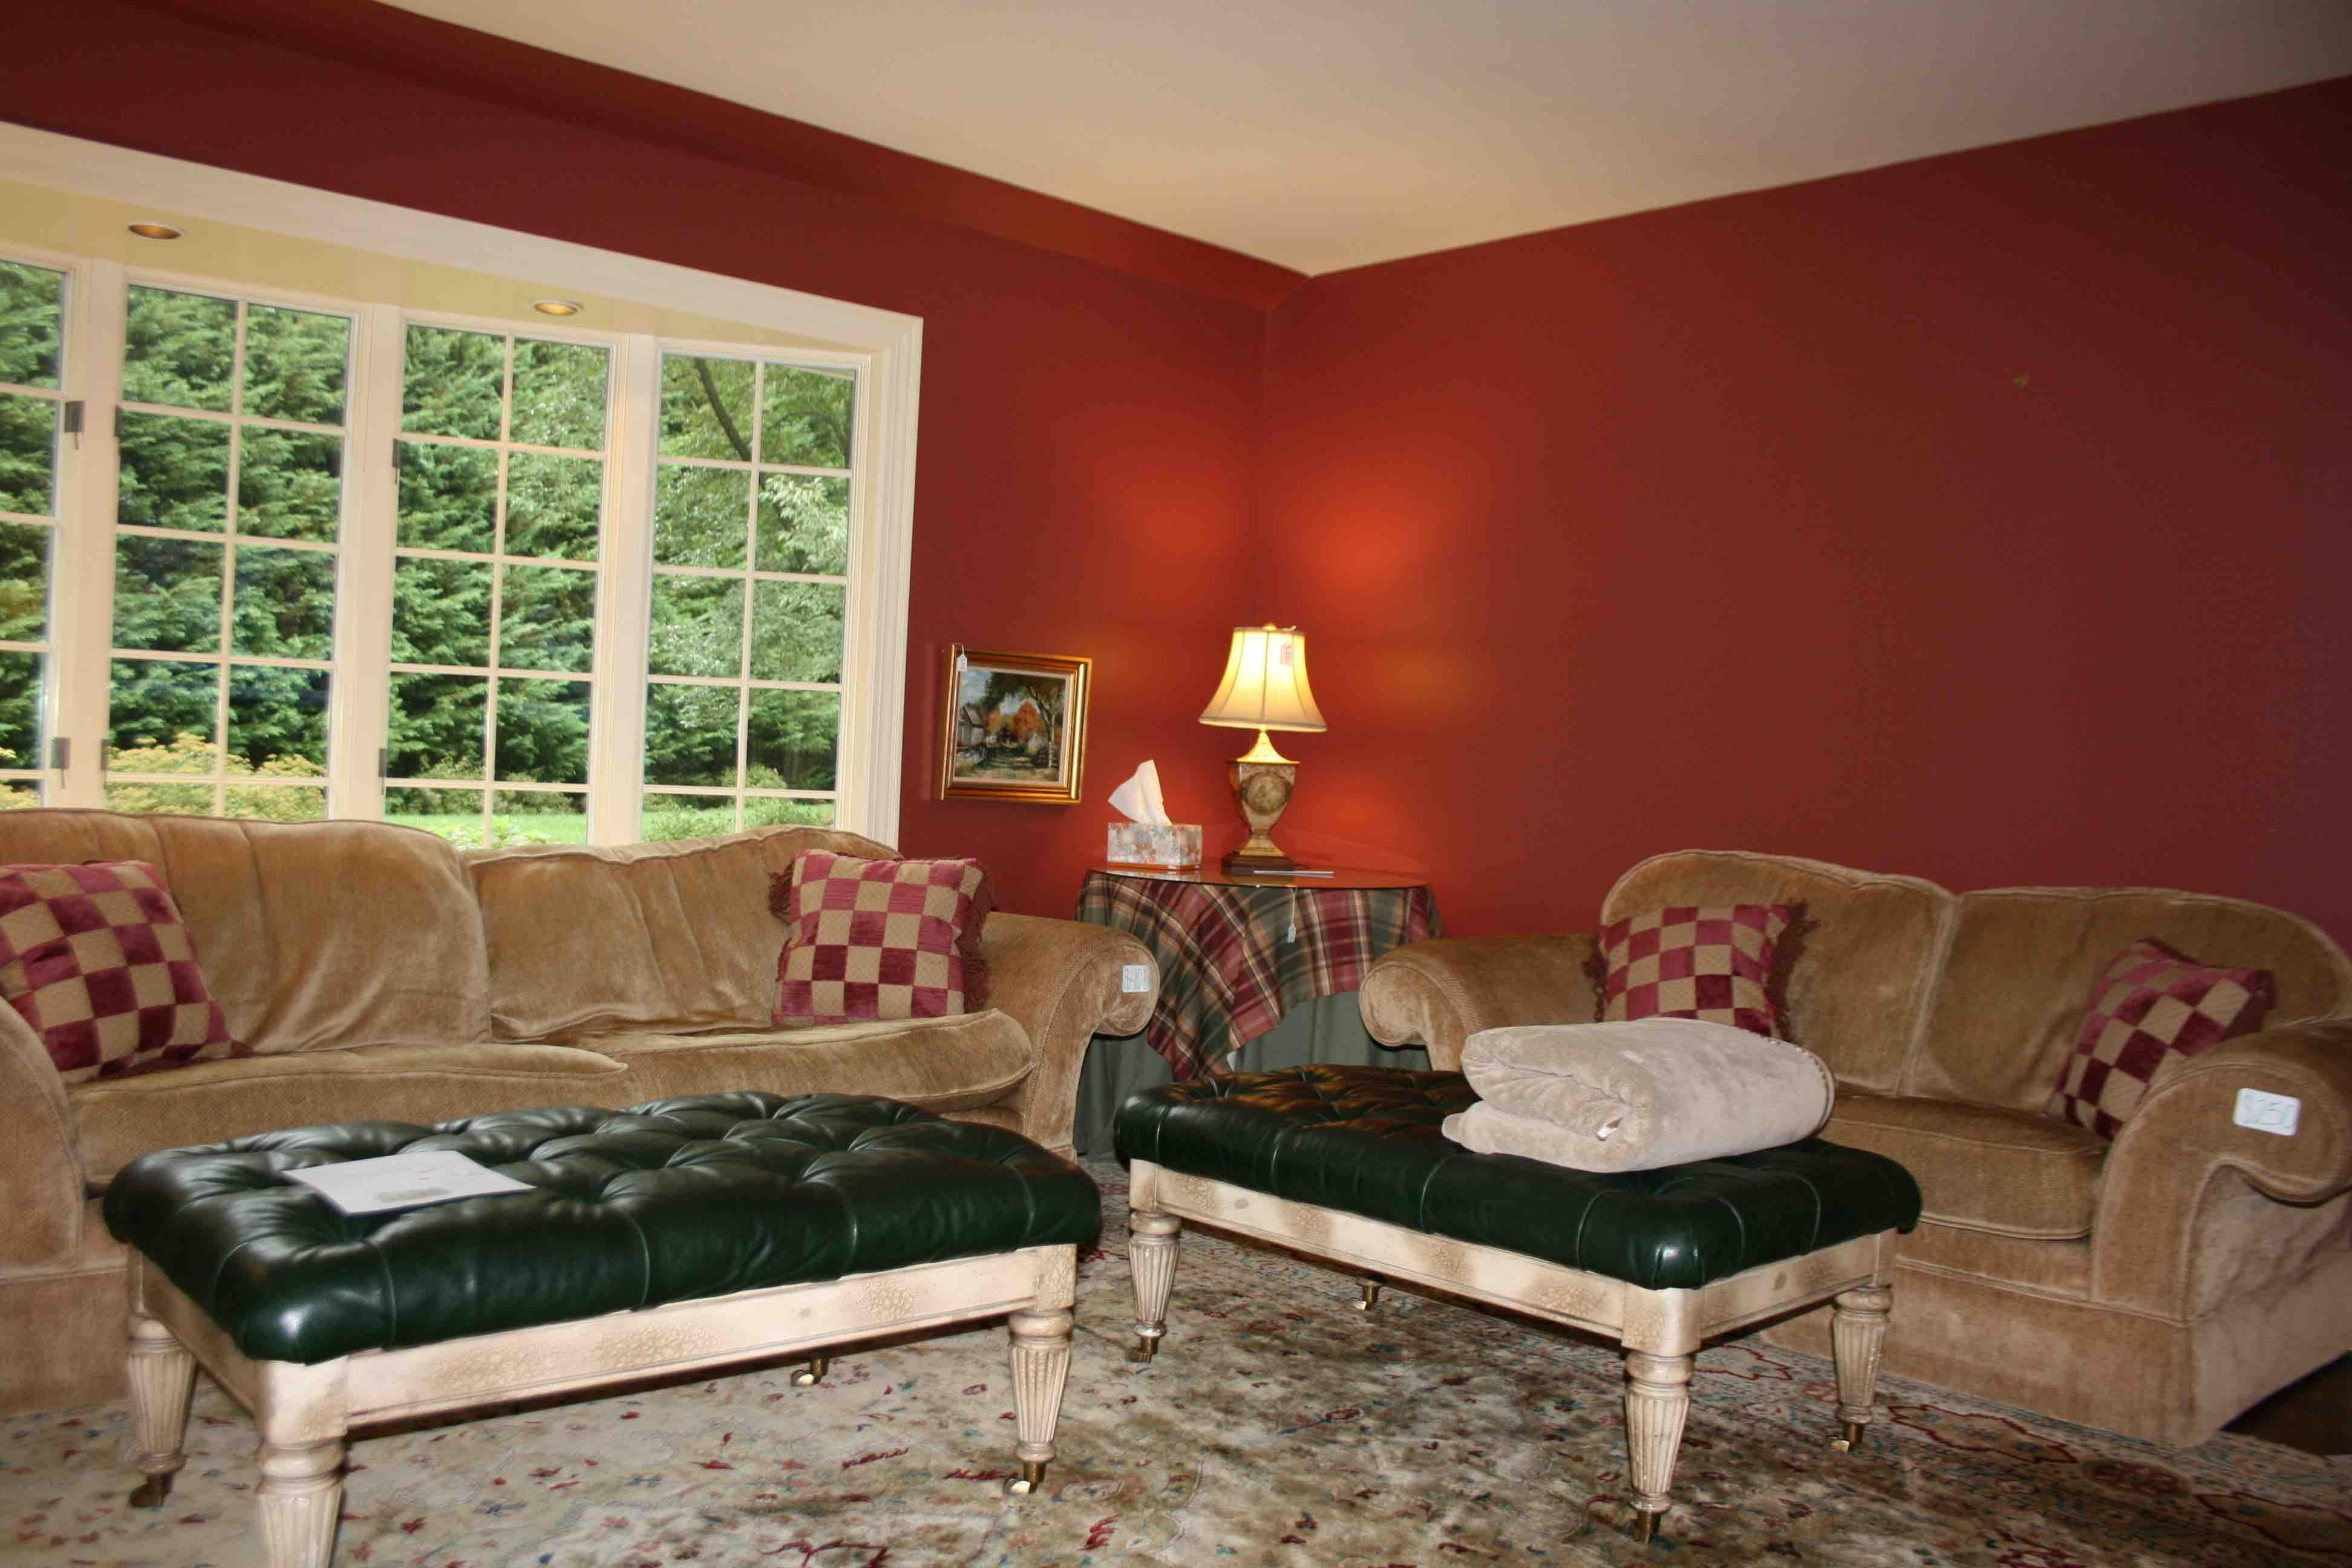 FAMILY ROOM – Summit, NJ Home Renovation BEFORE PHOTOS